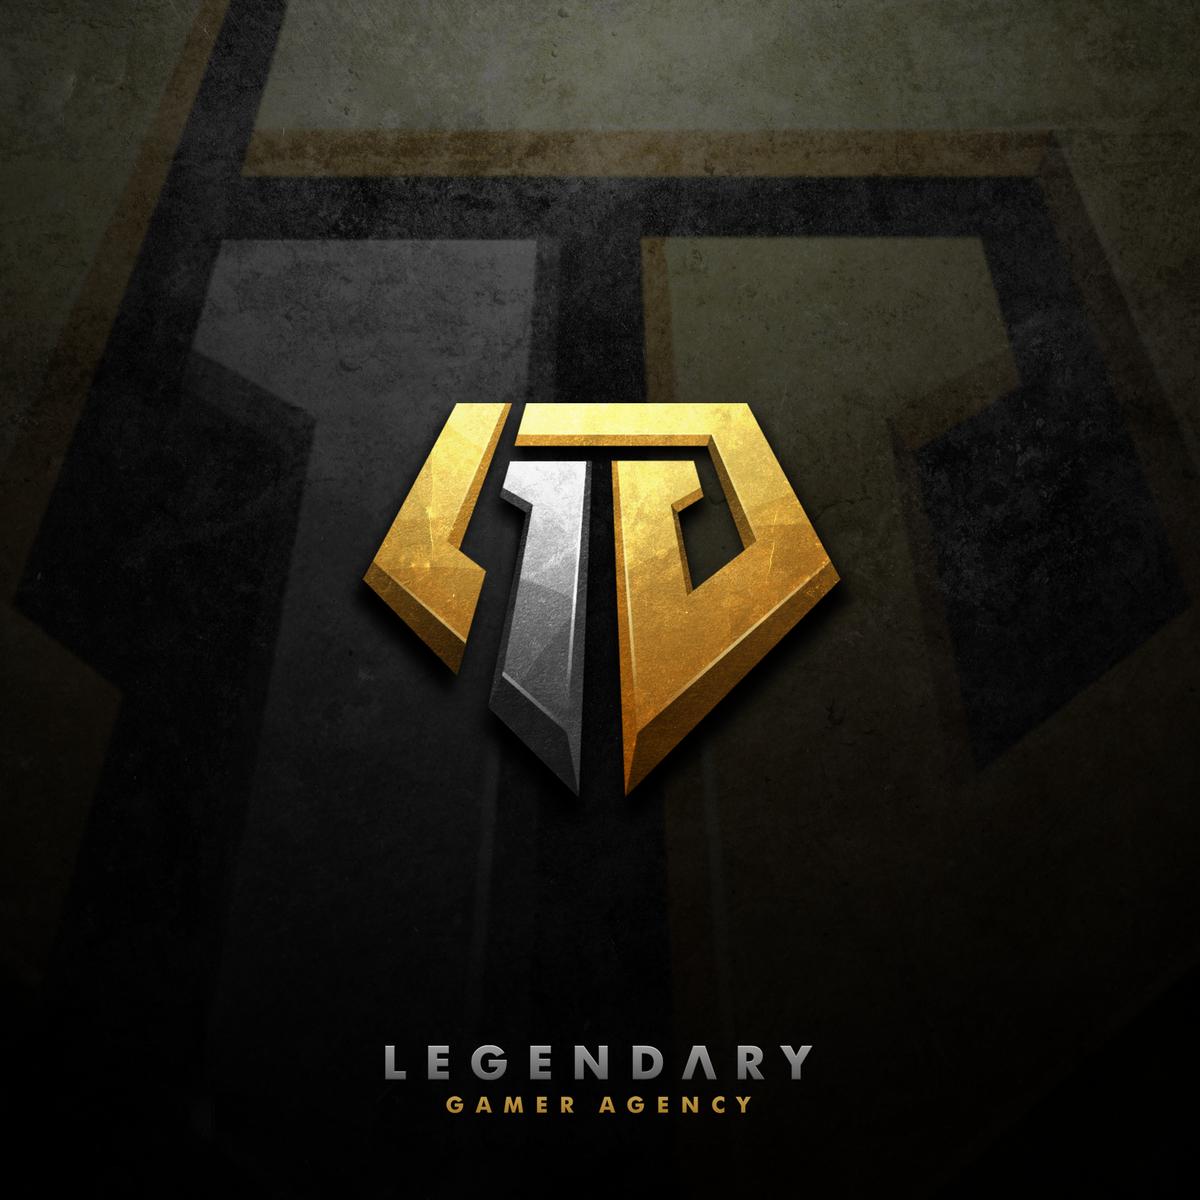 Logo re-branding for an eSports company